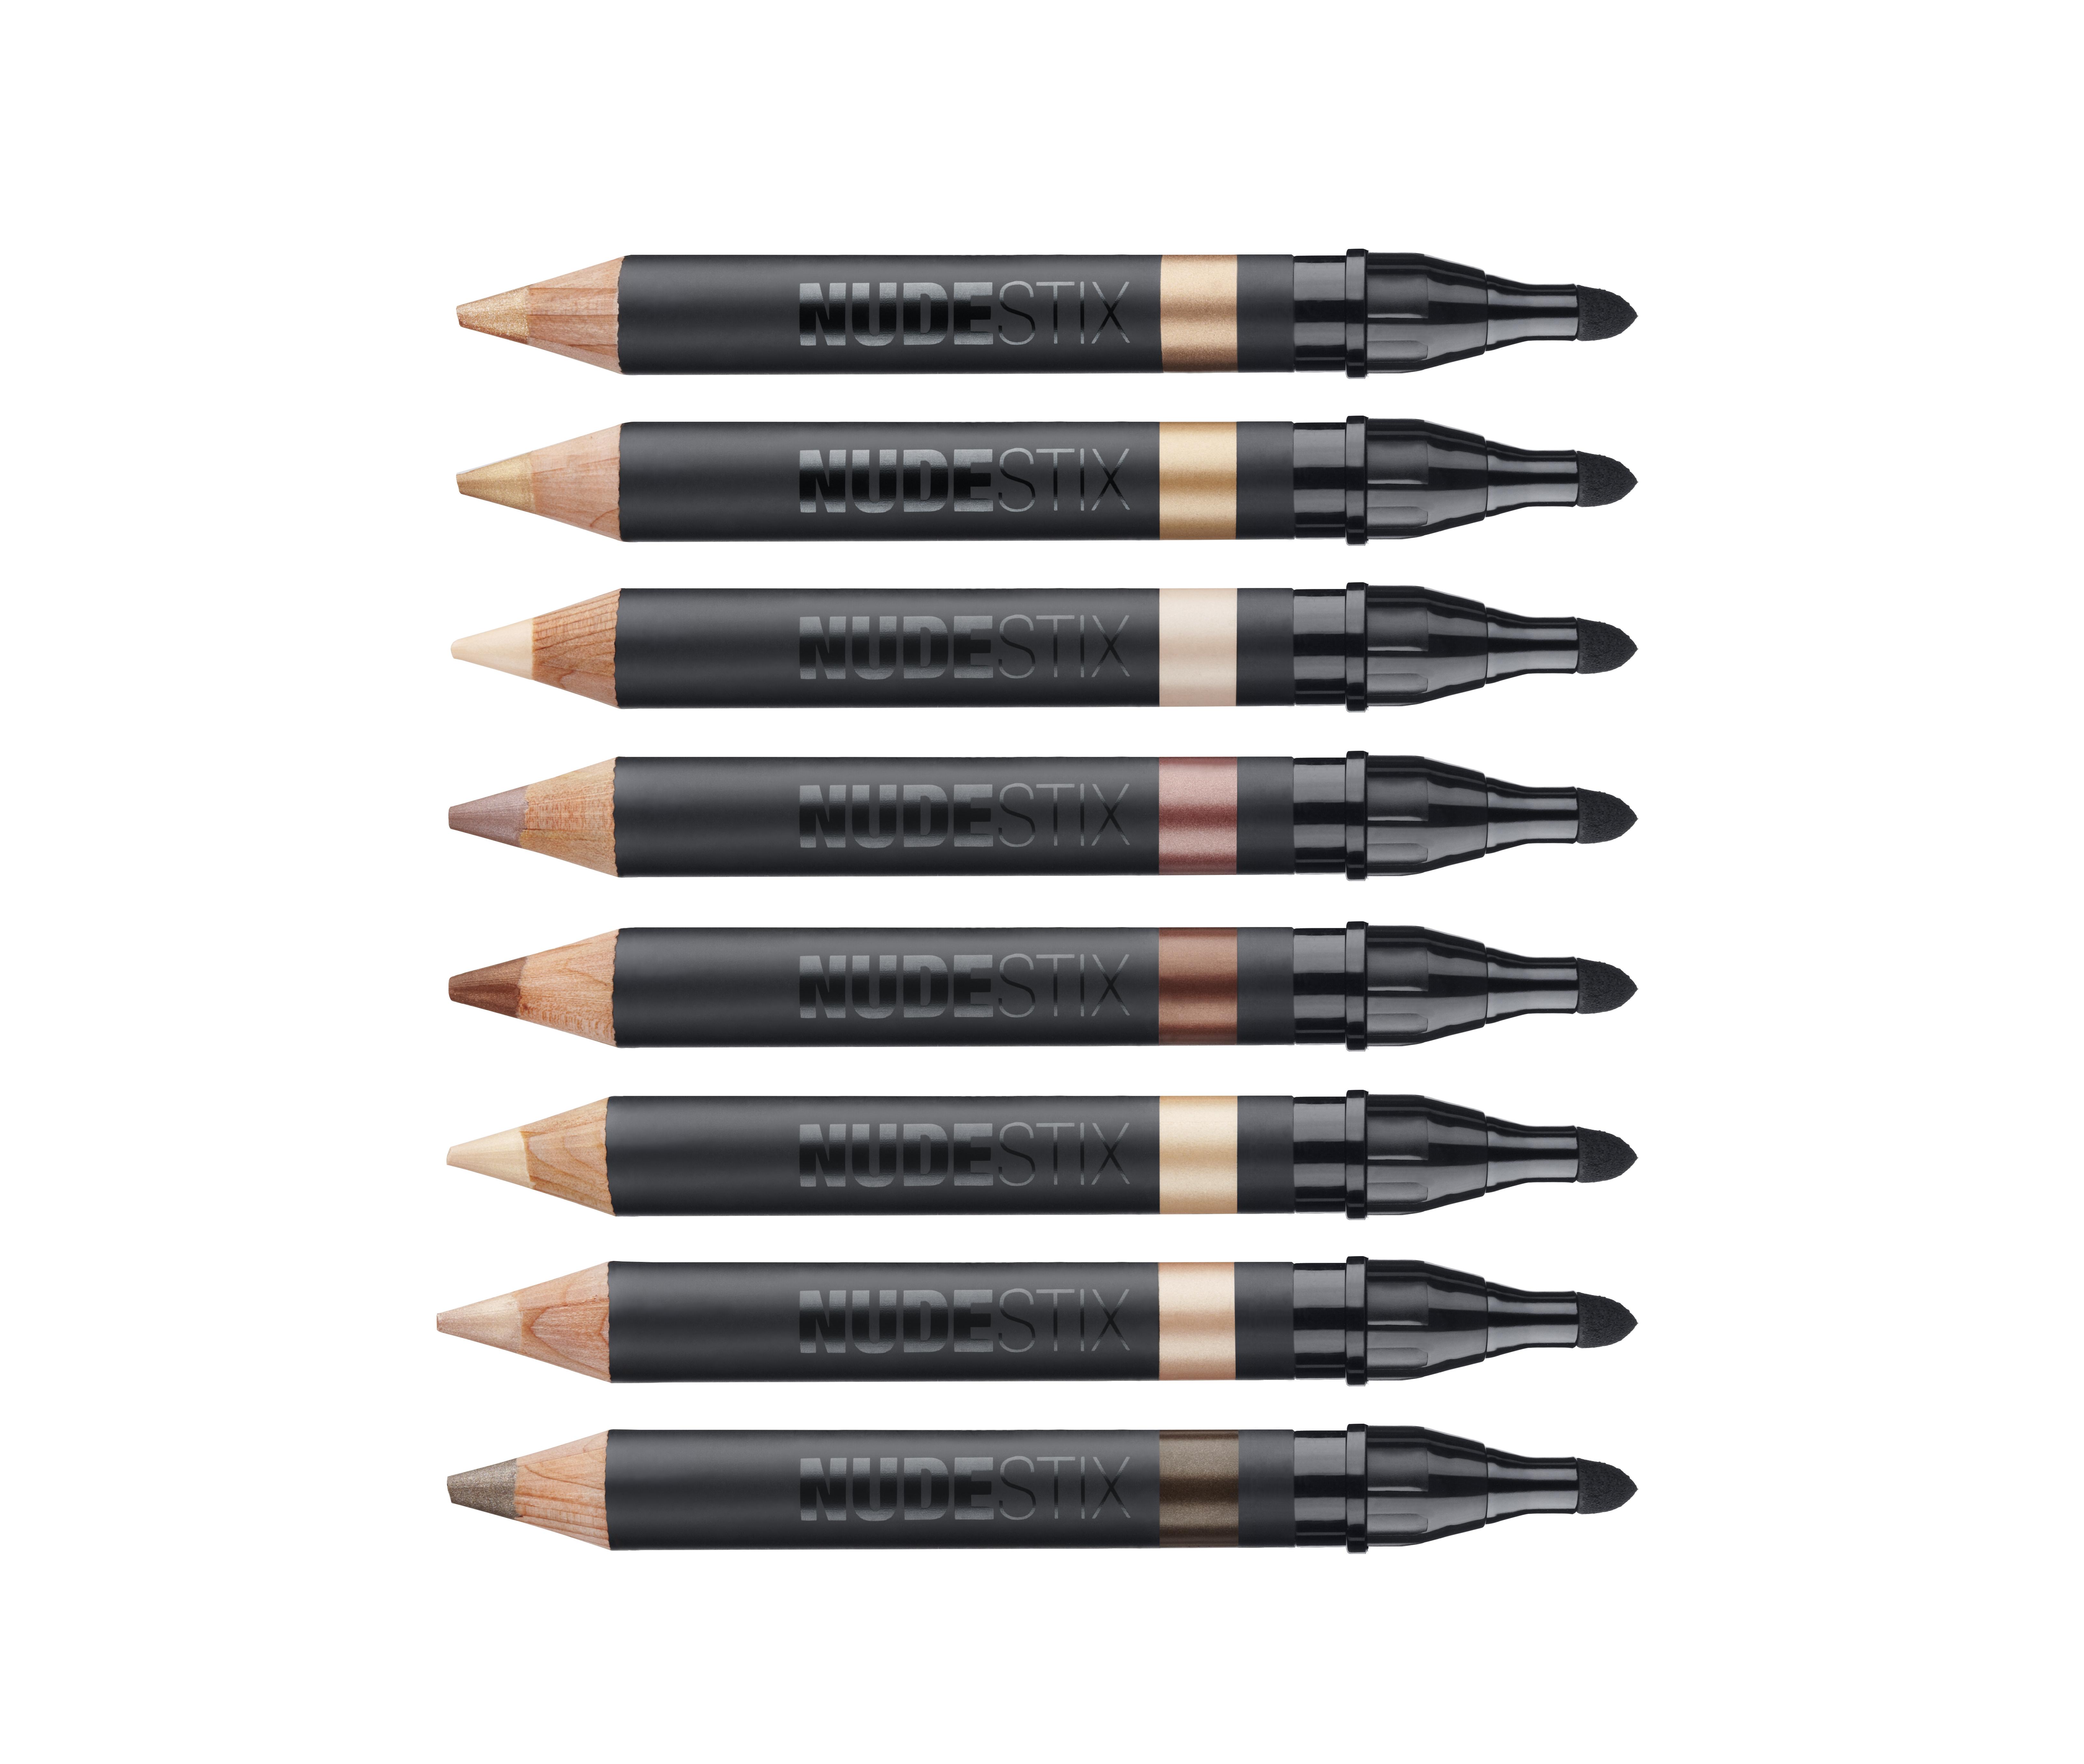 Nudestix eye pencils